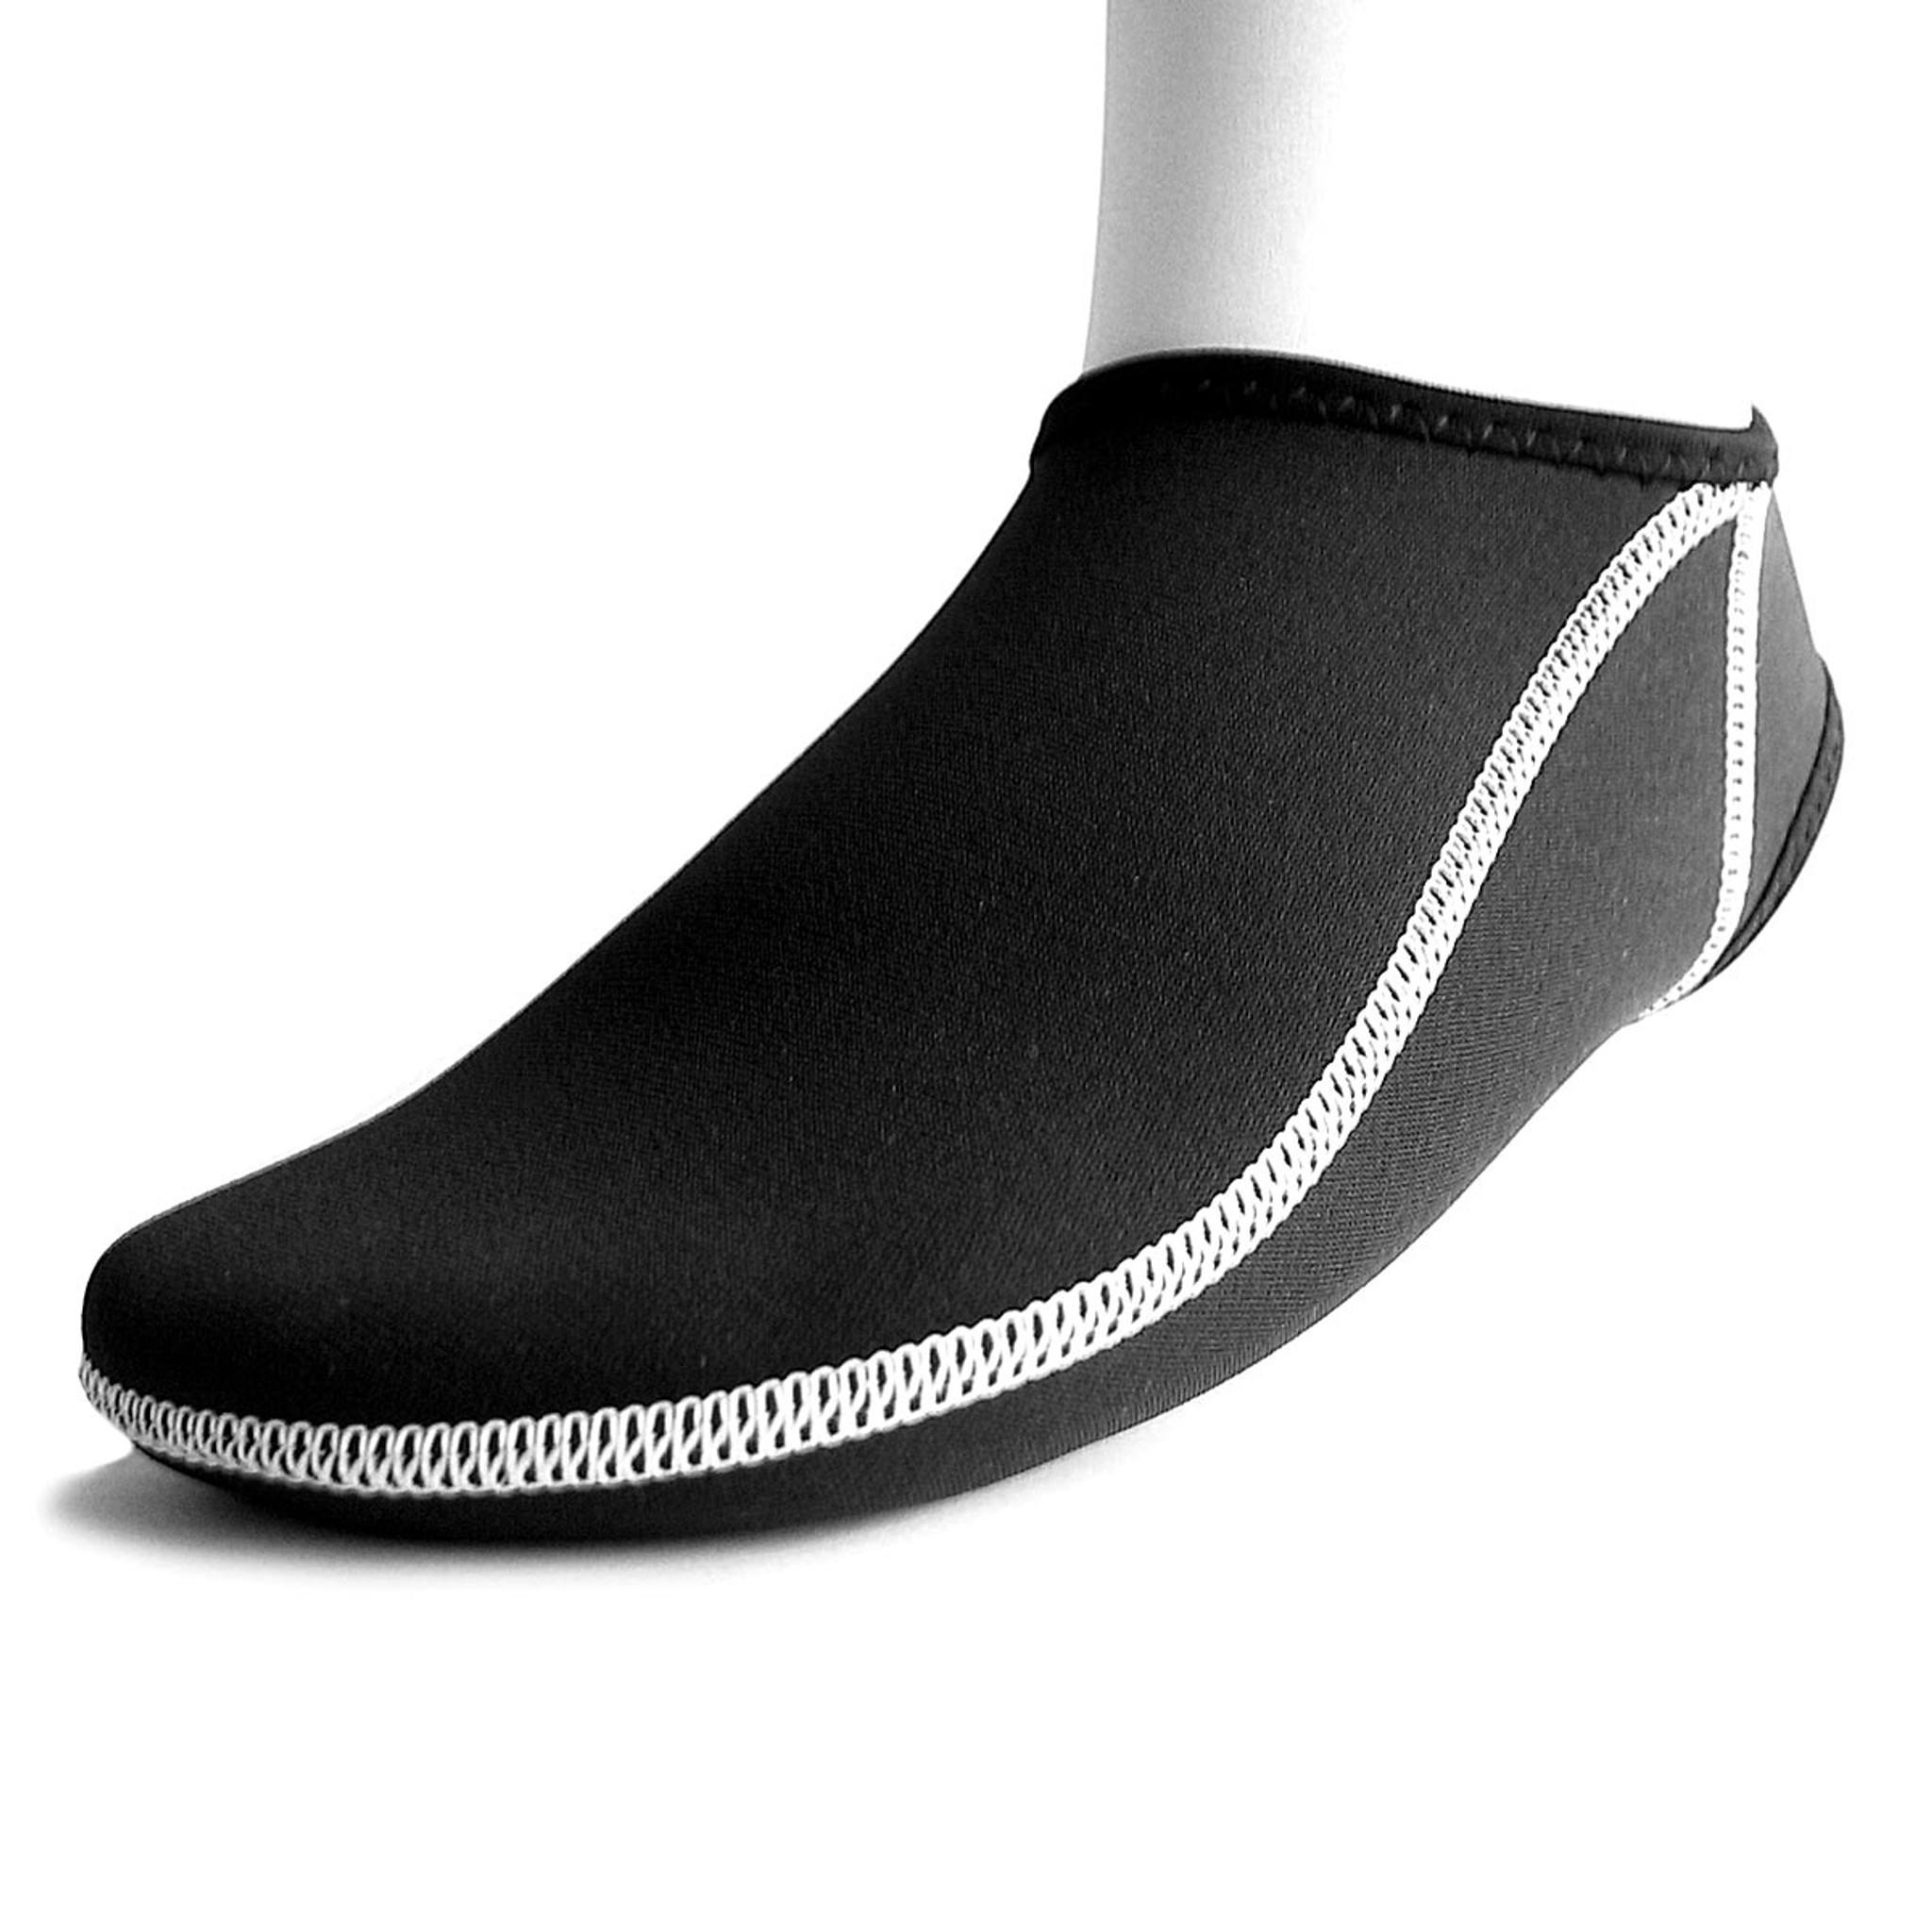 Bodysurfing Tools - PF2s - Handboard - Socks - Fins Straps